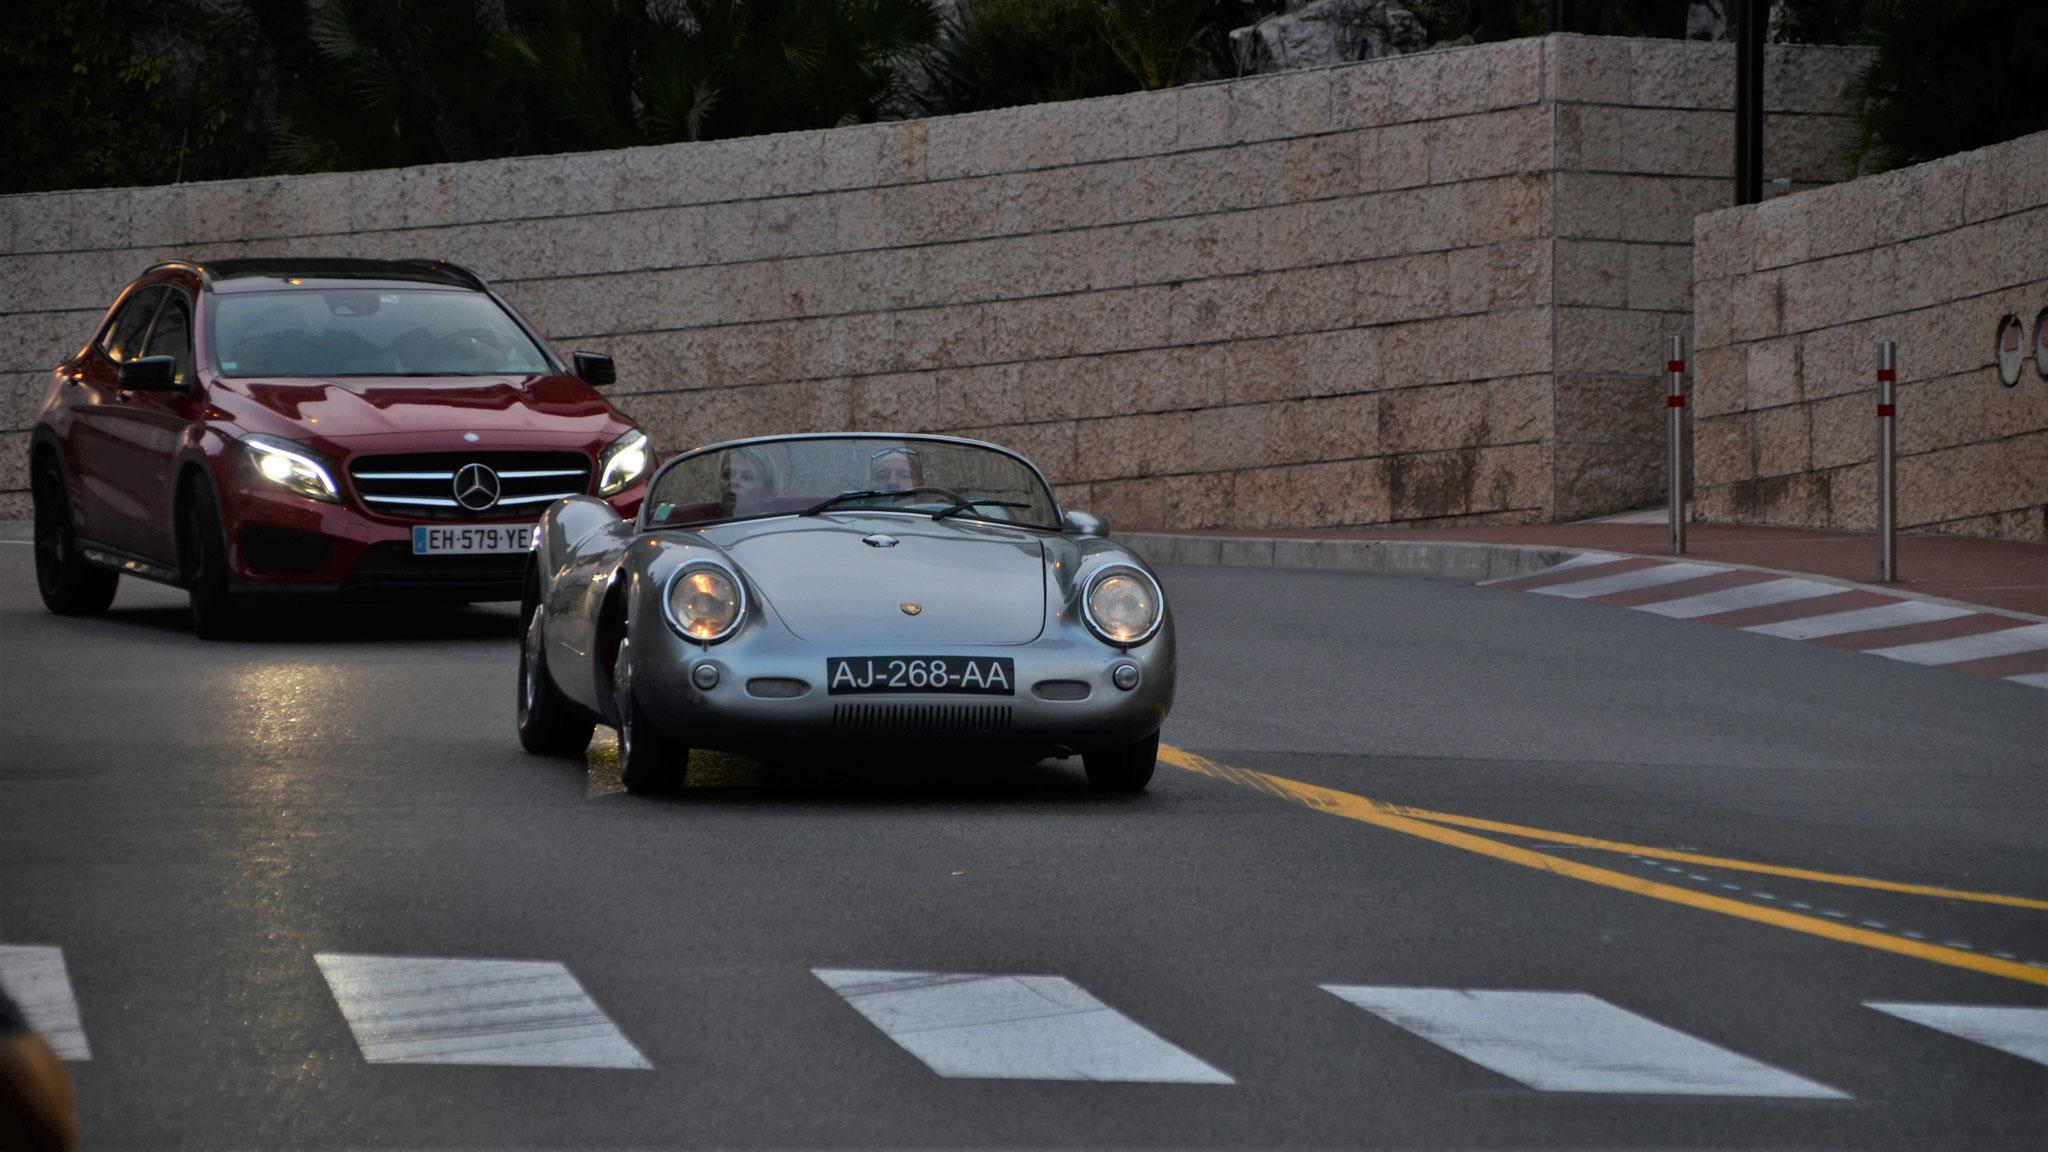 Porsche 550 Spyder - AJ-268-AA (FRA)